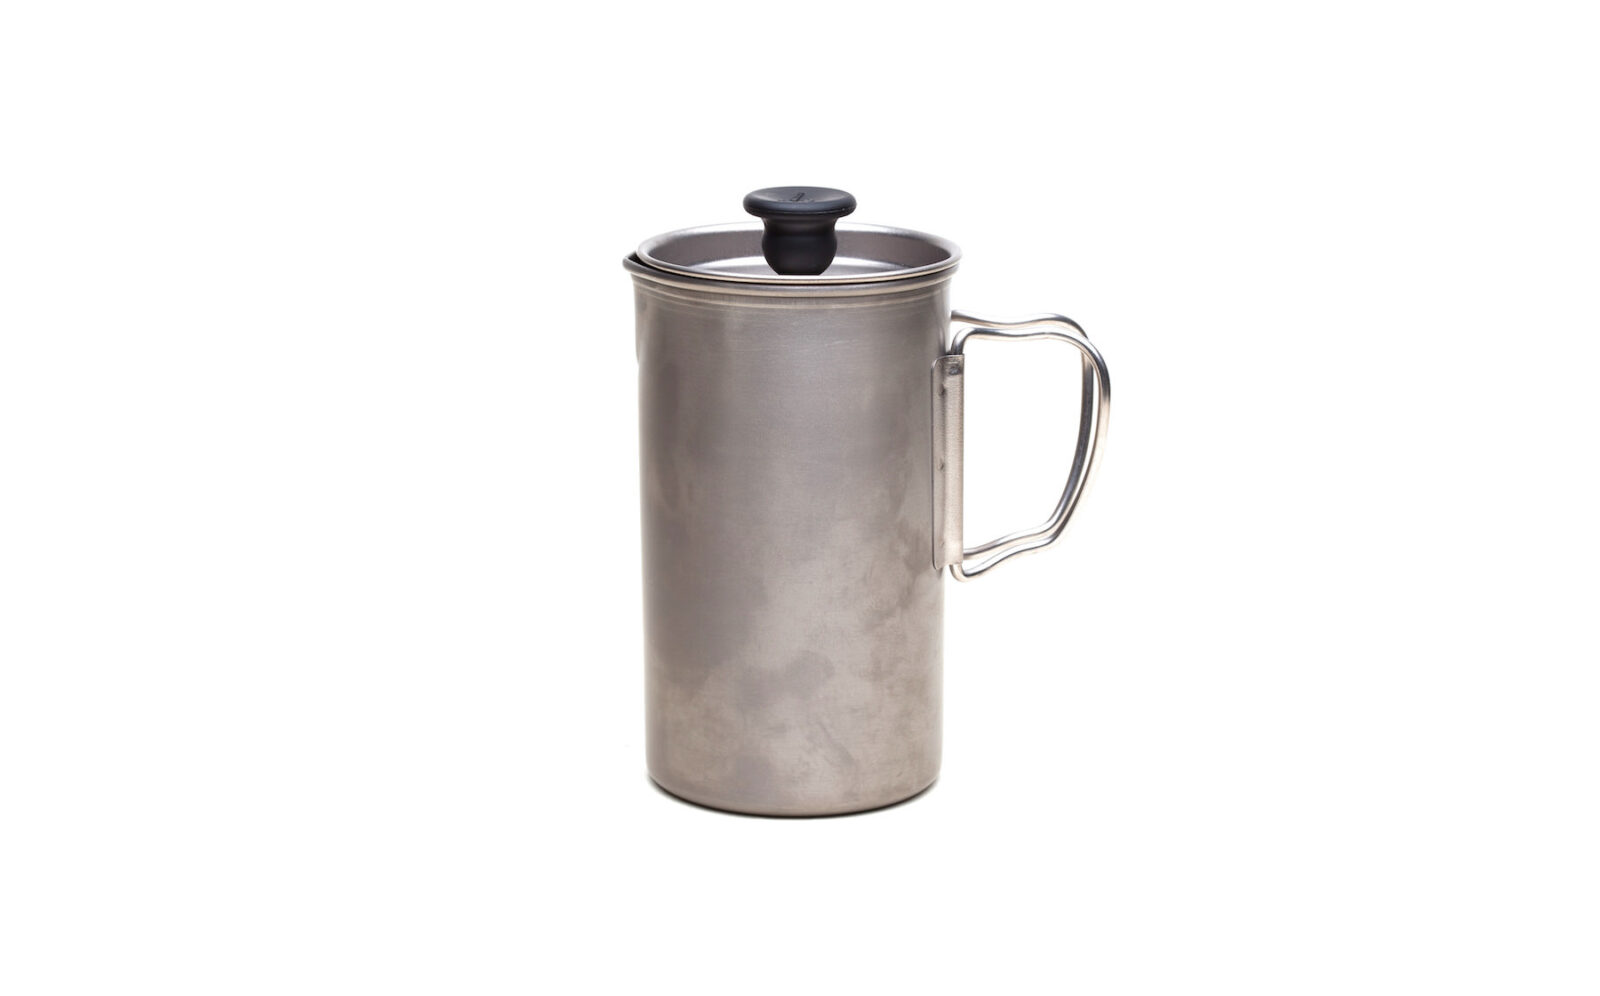 French Press Coffee Maker 1600x996 - Titanium French Press